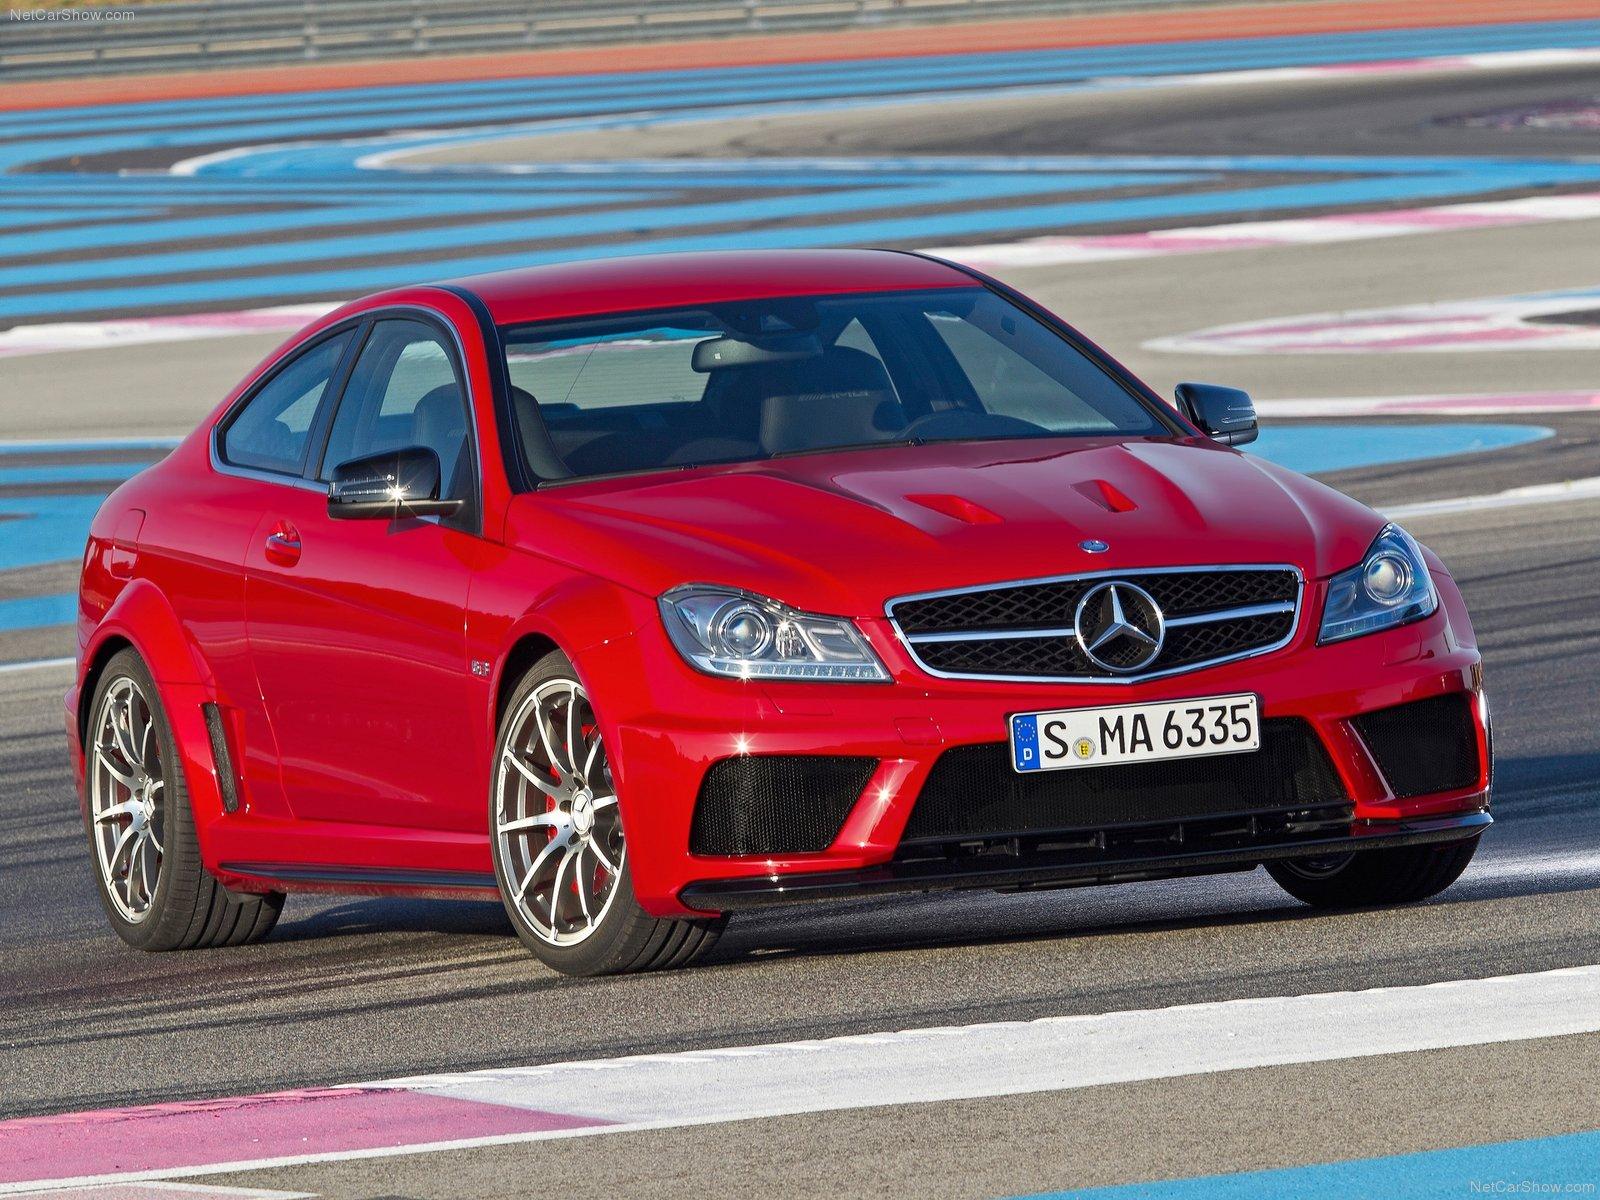 http://1.bp.blogspot.com/-O98J-v14XgI/TvTvhyY4HfI/AAAAAAAAEUE/m_xoYZkeO84/s1600/Mercedes-Benz-C63_AMG_Coupe_Black_Series_2012_1600x1200_wallpaper_03.jpg